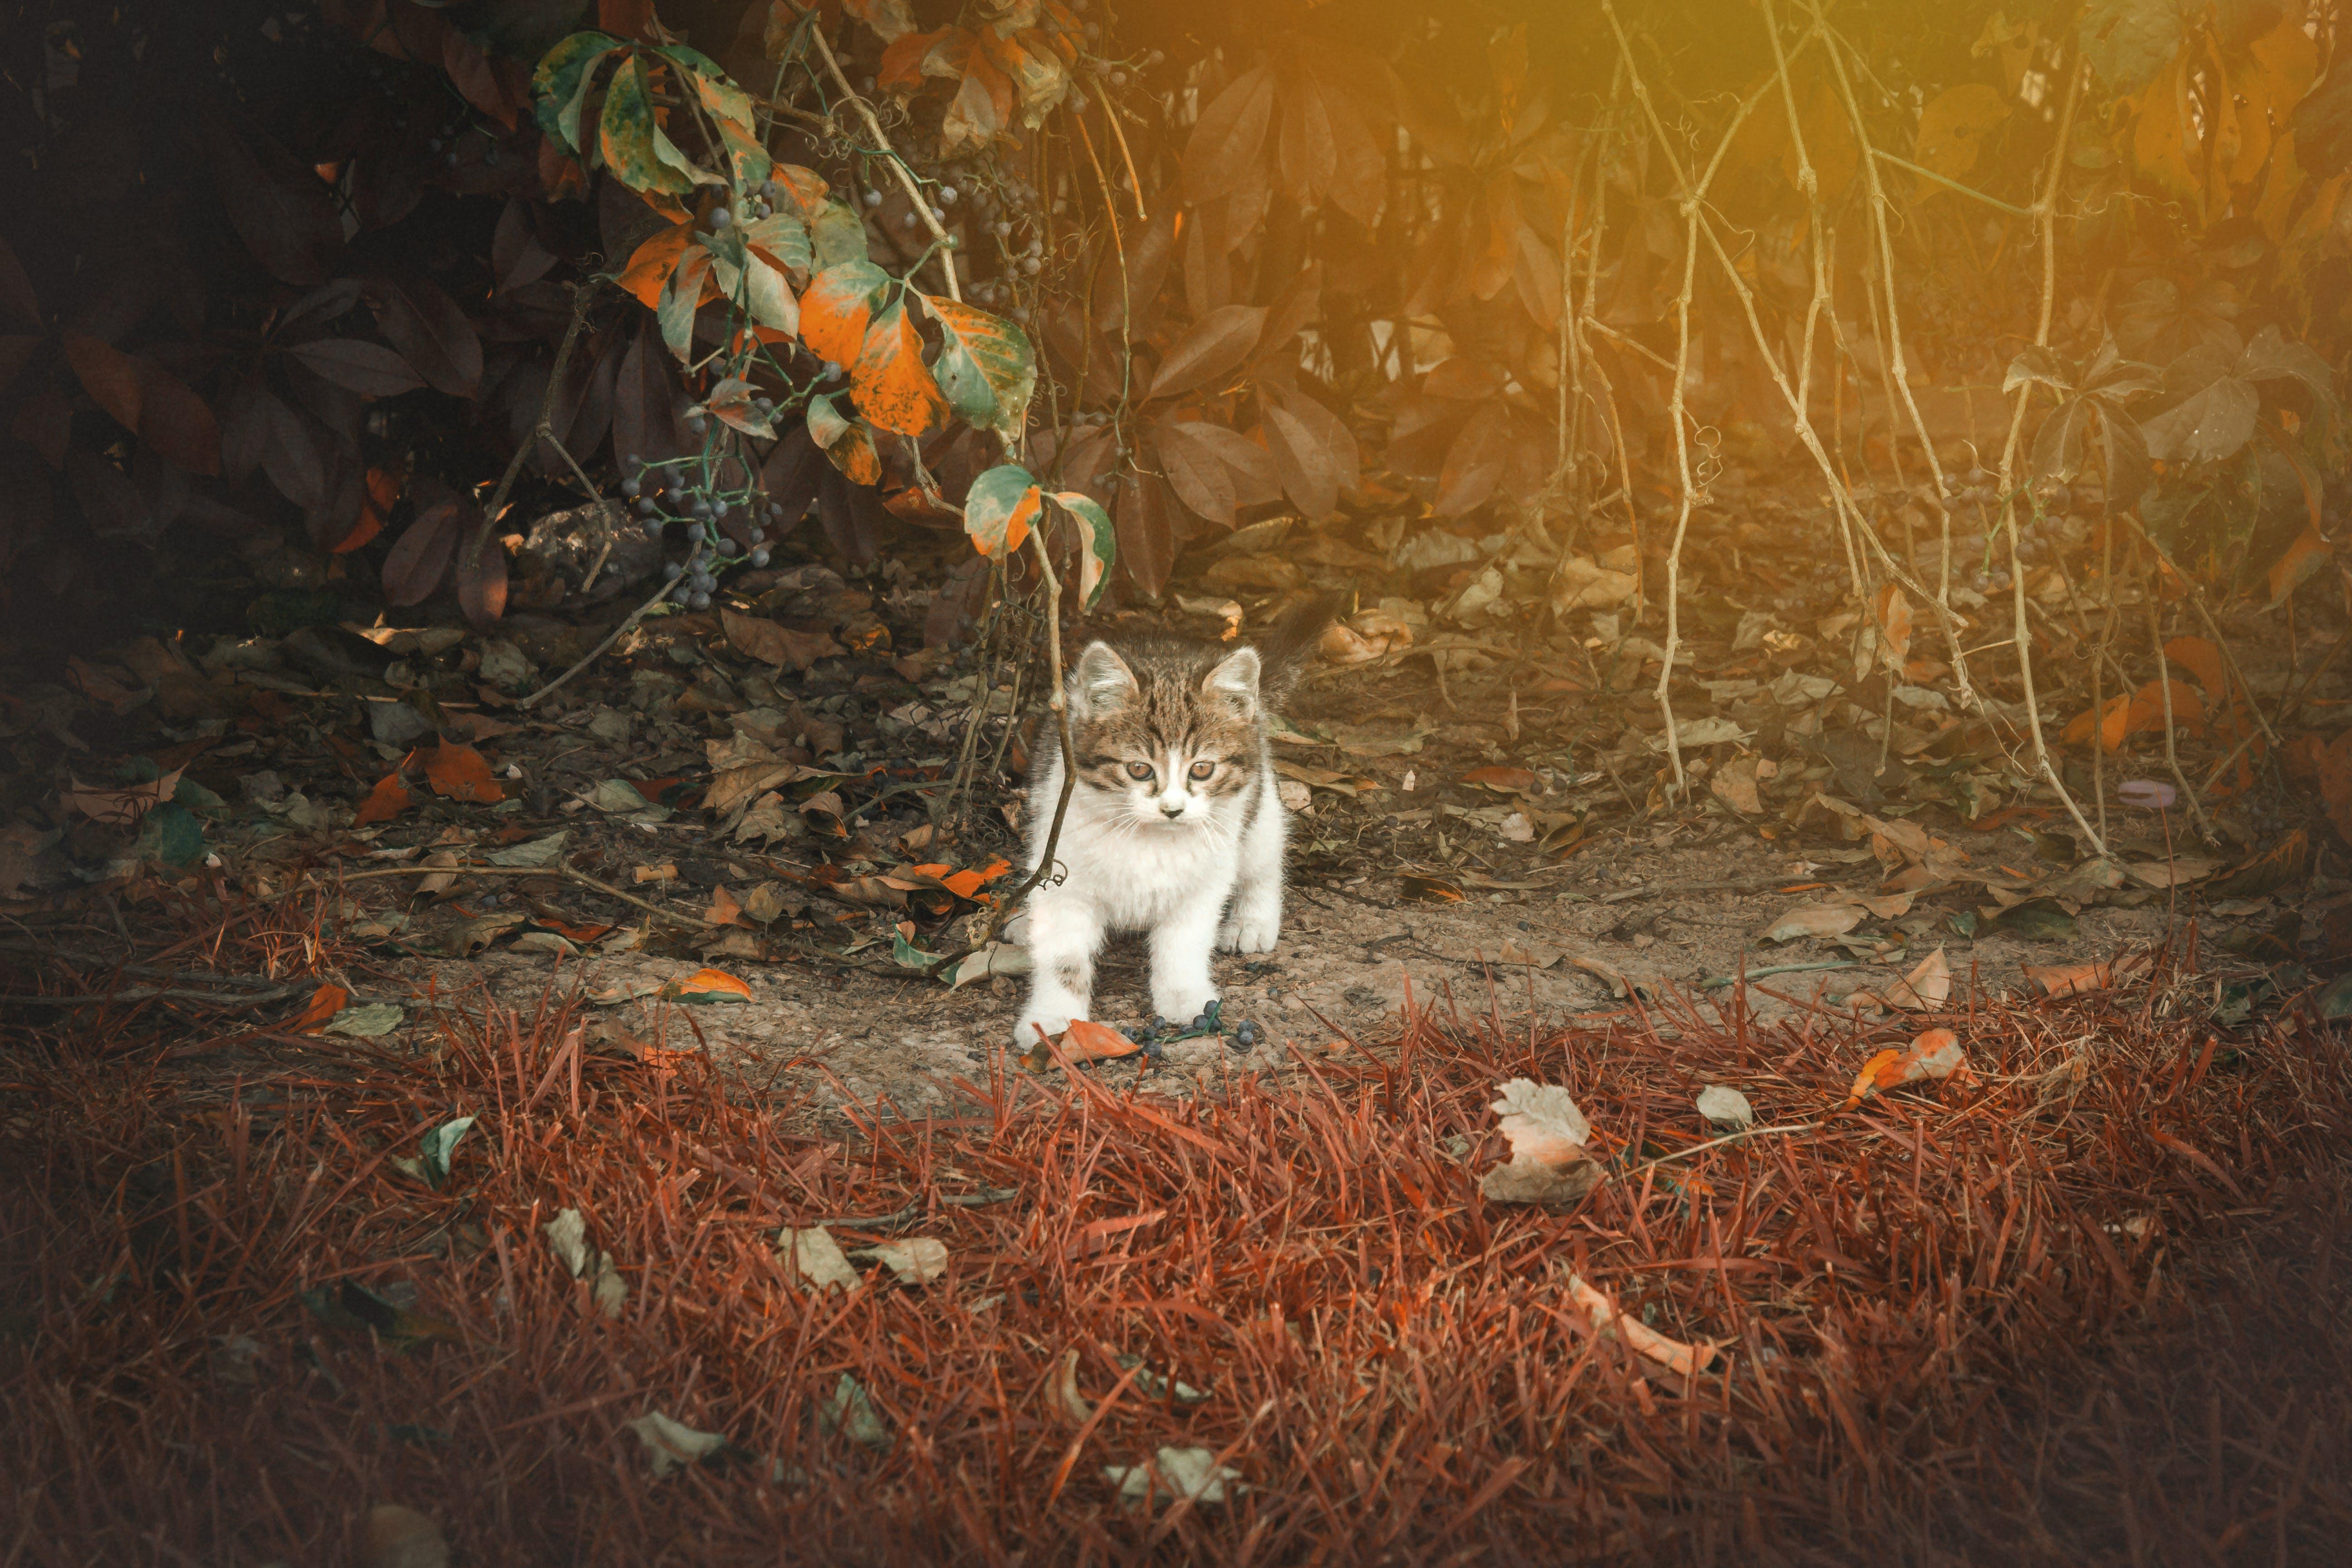 Free stock photo of animal, animal photography, autumn, cat